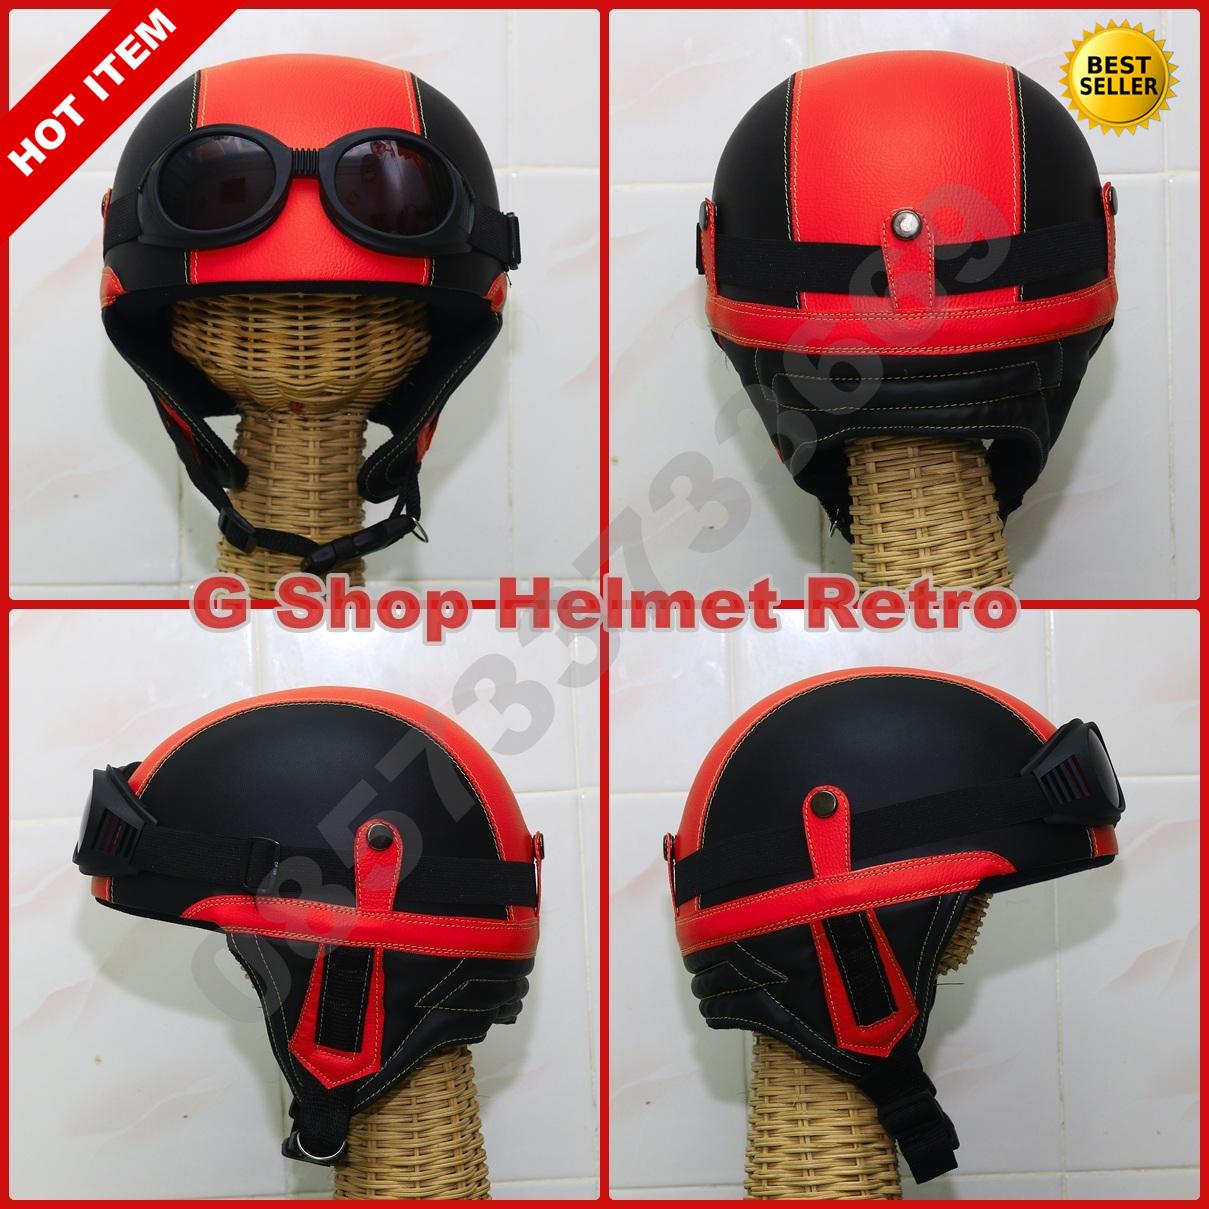 Helm Retro Jadul Chips Merah (vespa,cb,ulung)